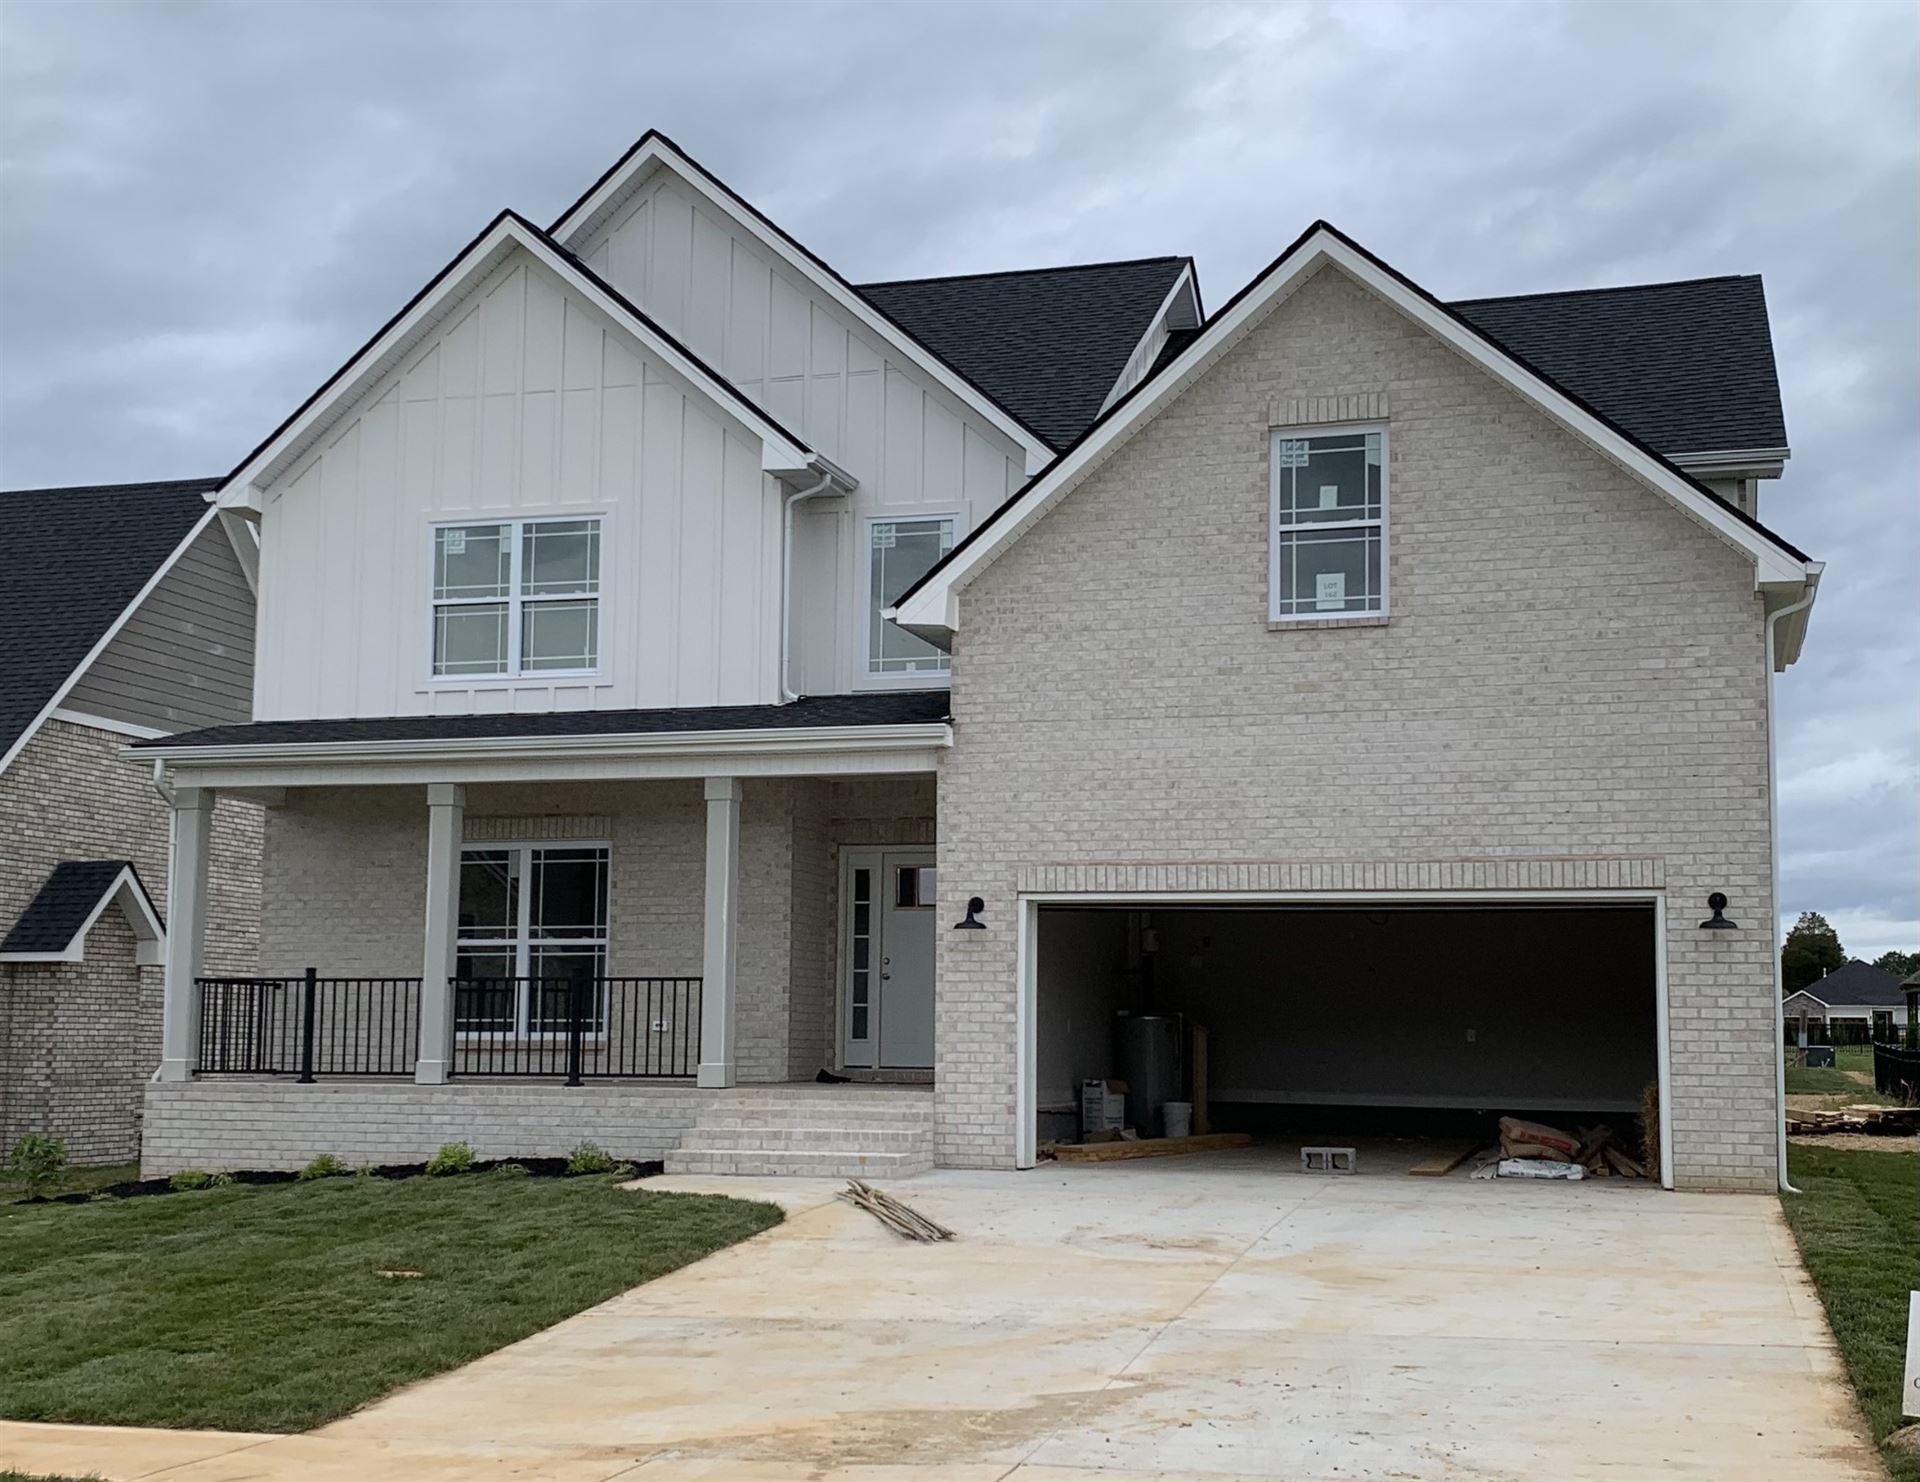 162 Hereford Farm, Clarksville, TN 37043 - MLS#: 2240178